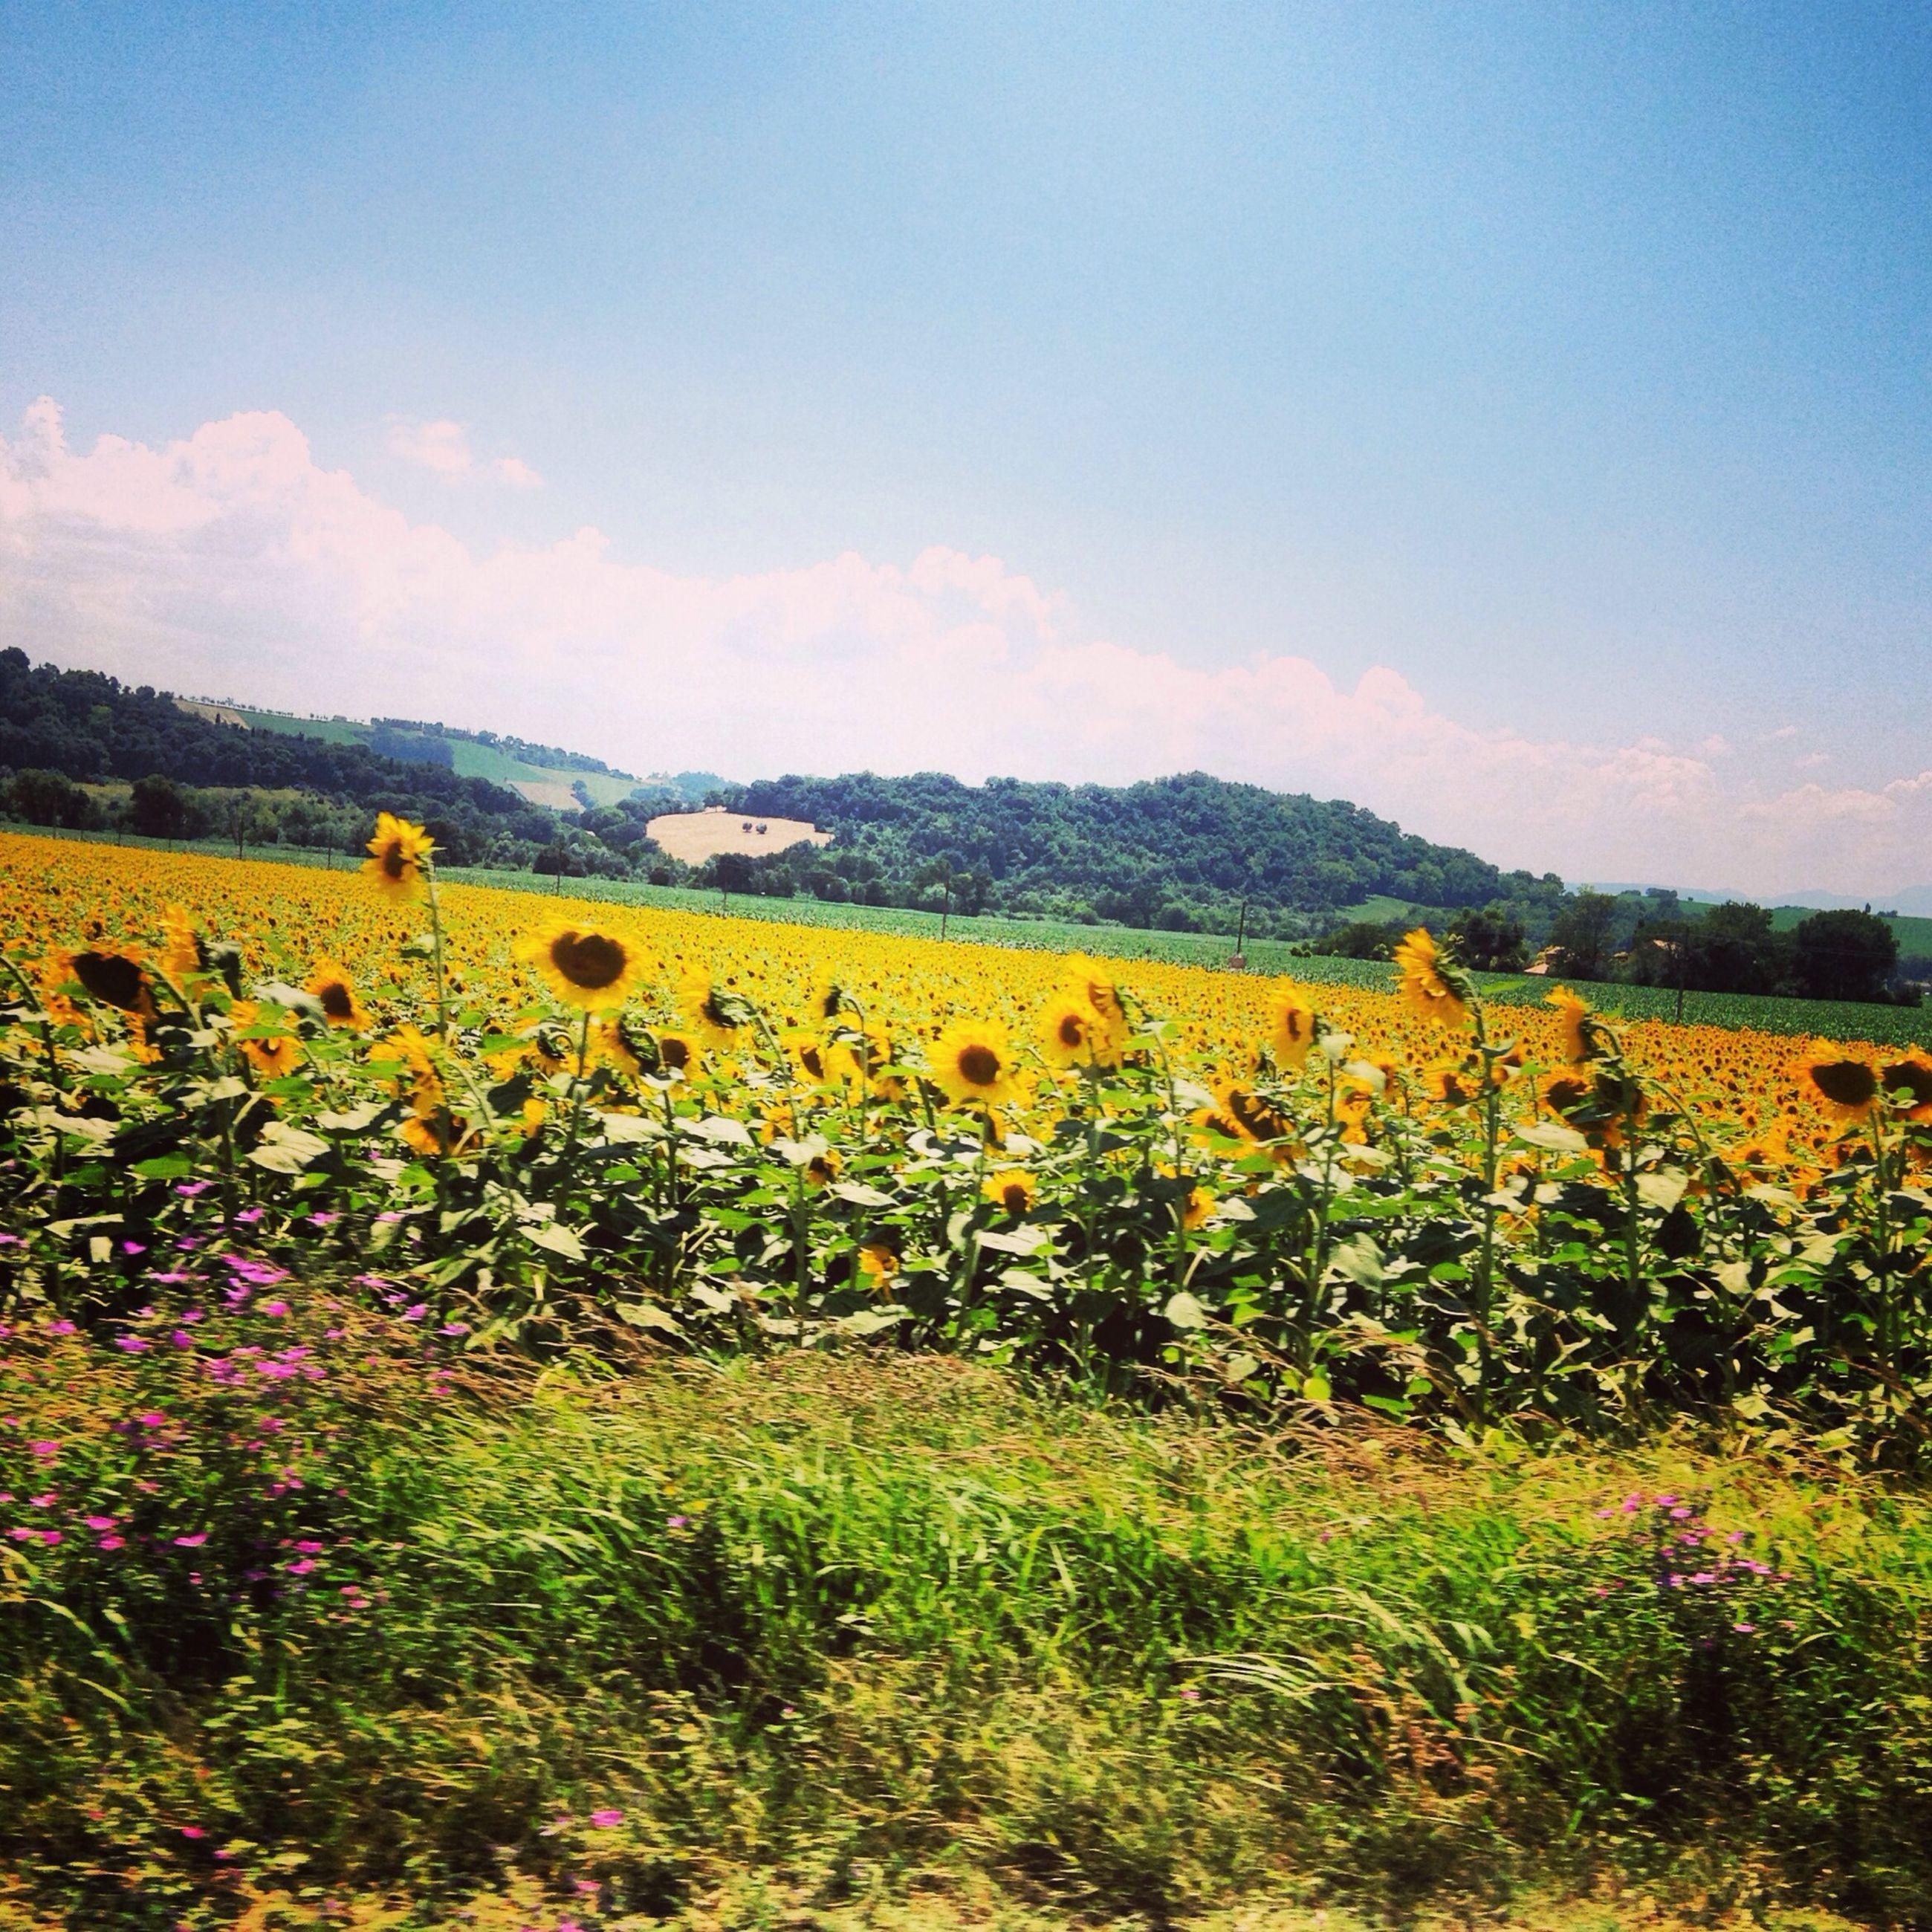 flower, yellow, field, rural scene, beauty in nature, agriculture, growth, landscape, sky, freshness, tranquil scene, nature, scenics, farm, tranquility, plant, oilseed rape, sunflower, crop, abundance